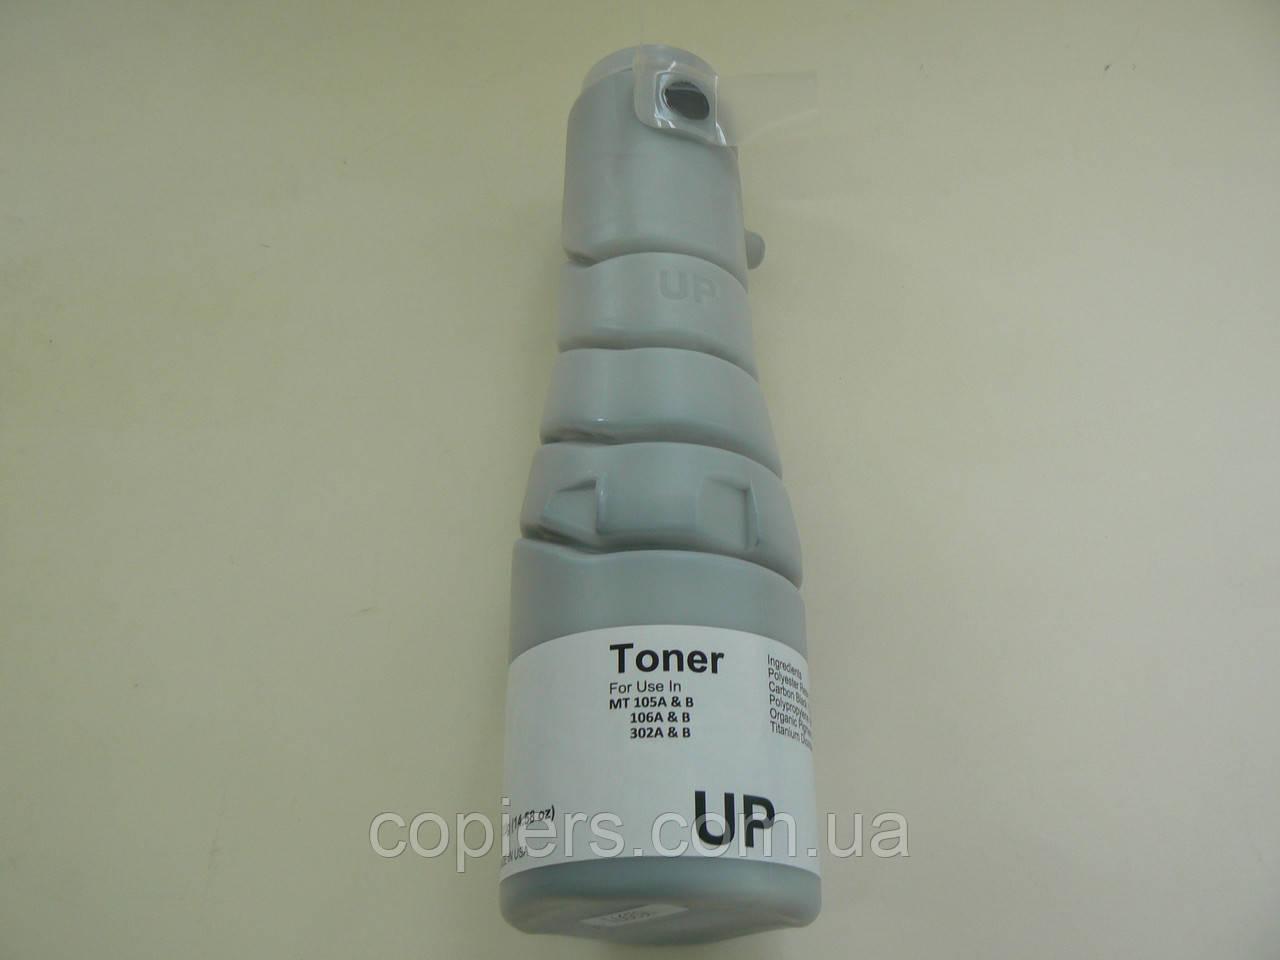 Тонер картридж TN-114 Konica Minolta bizhub 162/163/180/181210/211 не оригинал